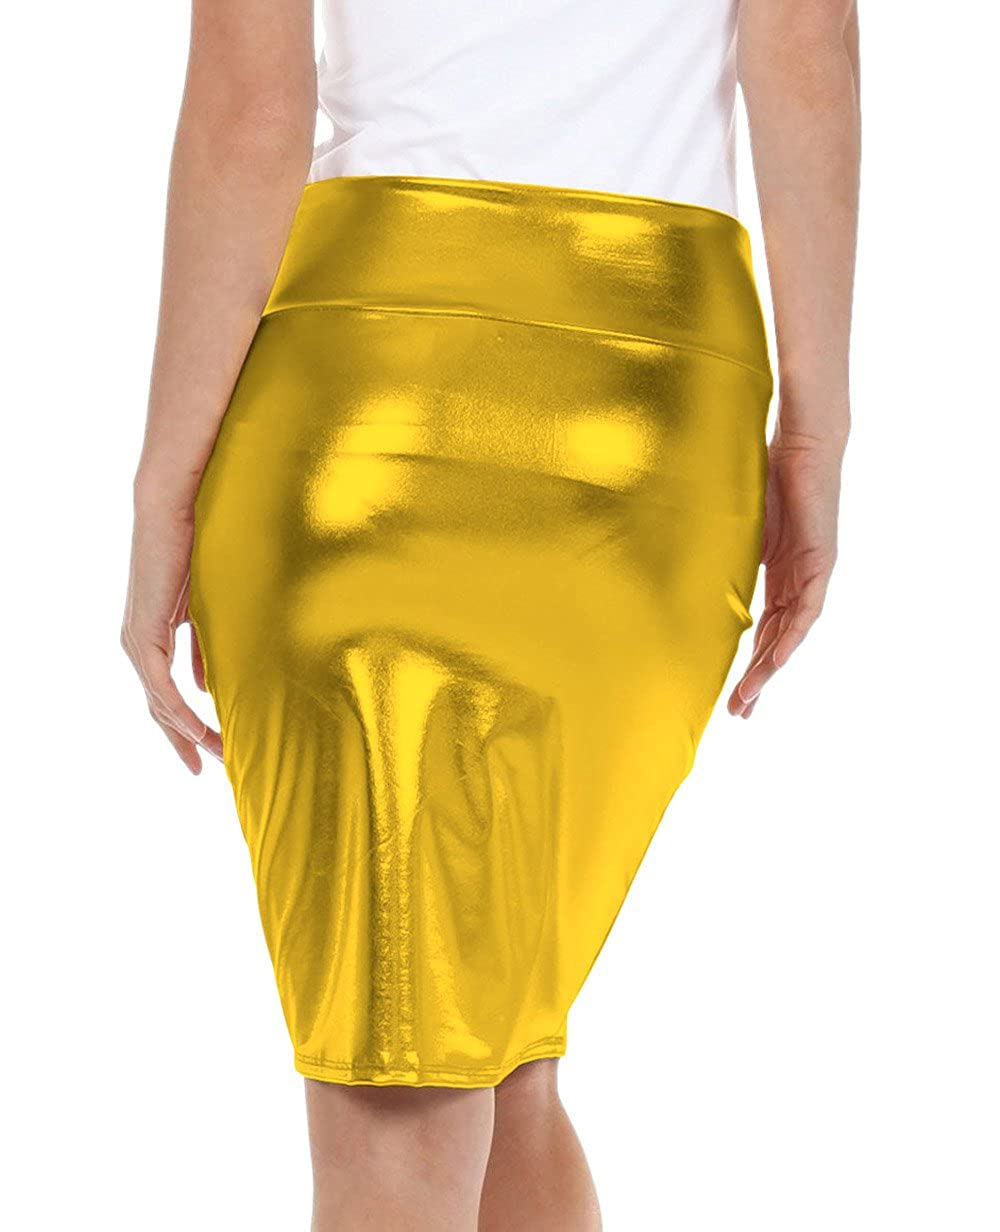 Sheface Girls Shiny Metallic High Waist Midi Pencil Skirt Clubwear